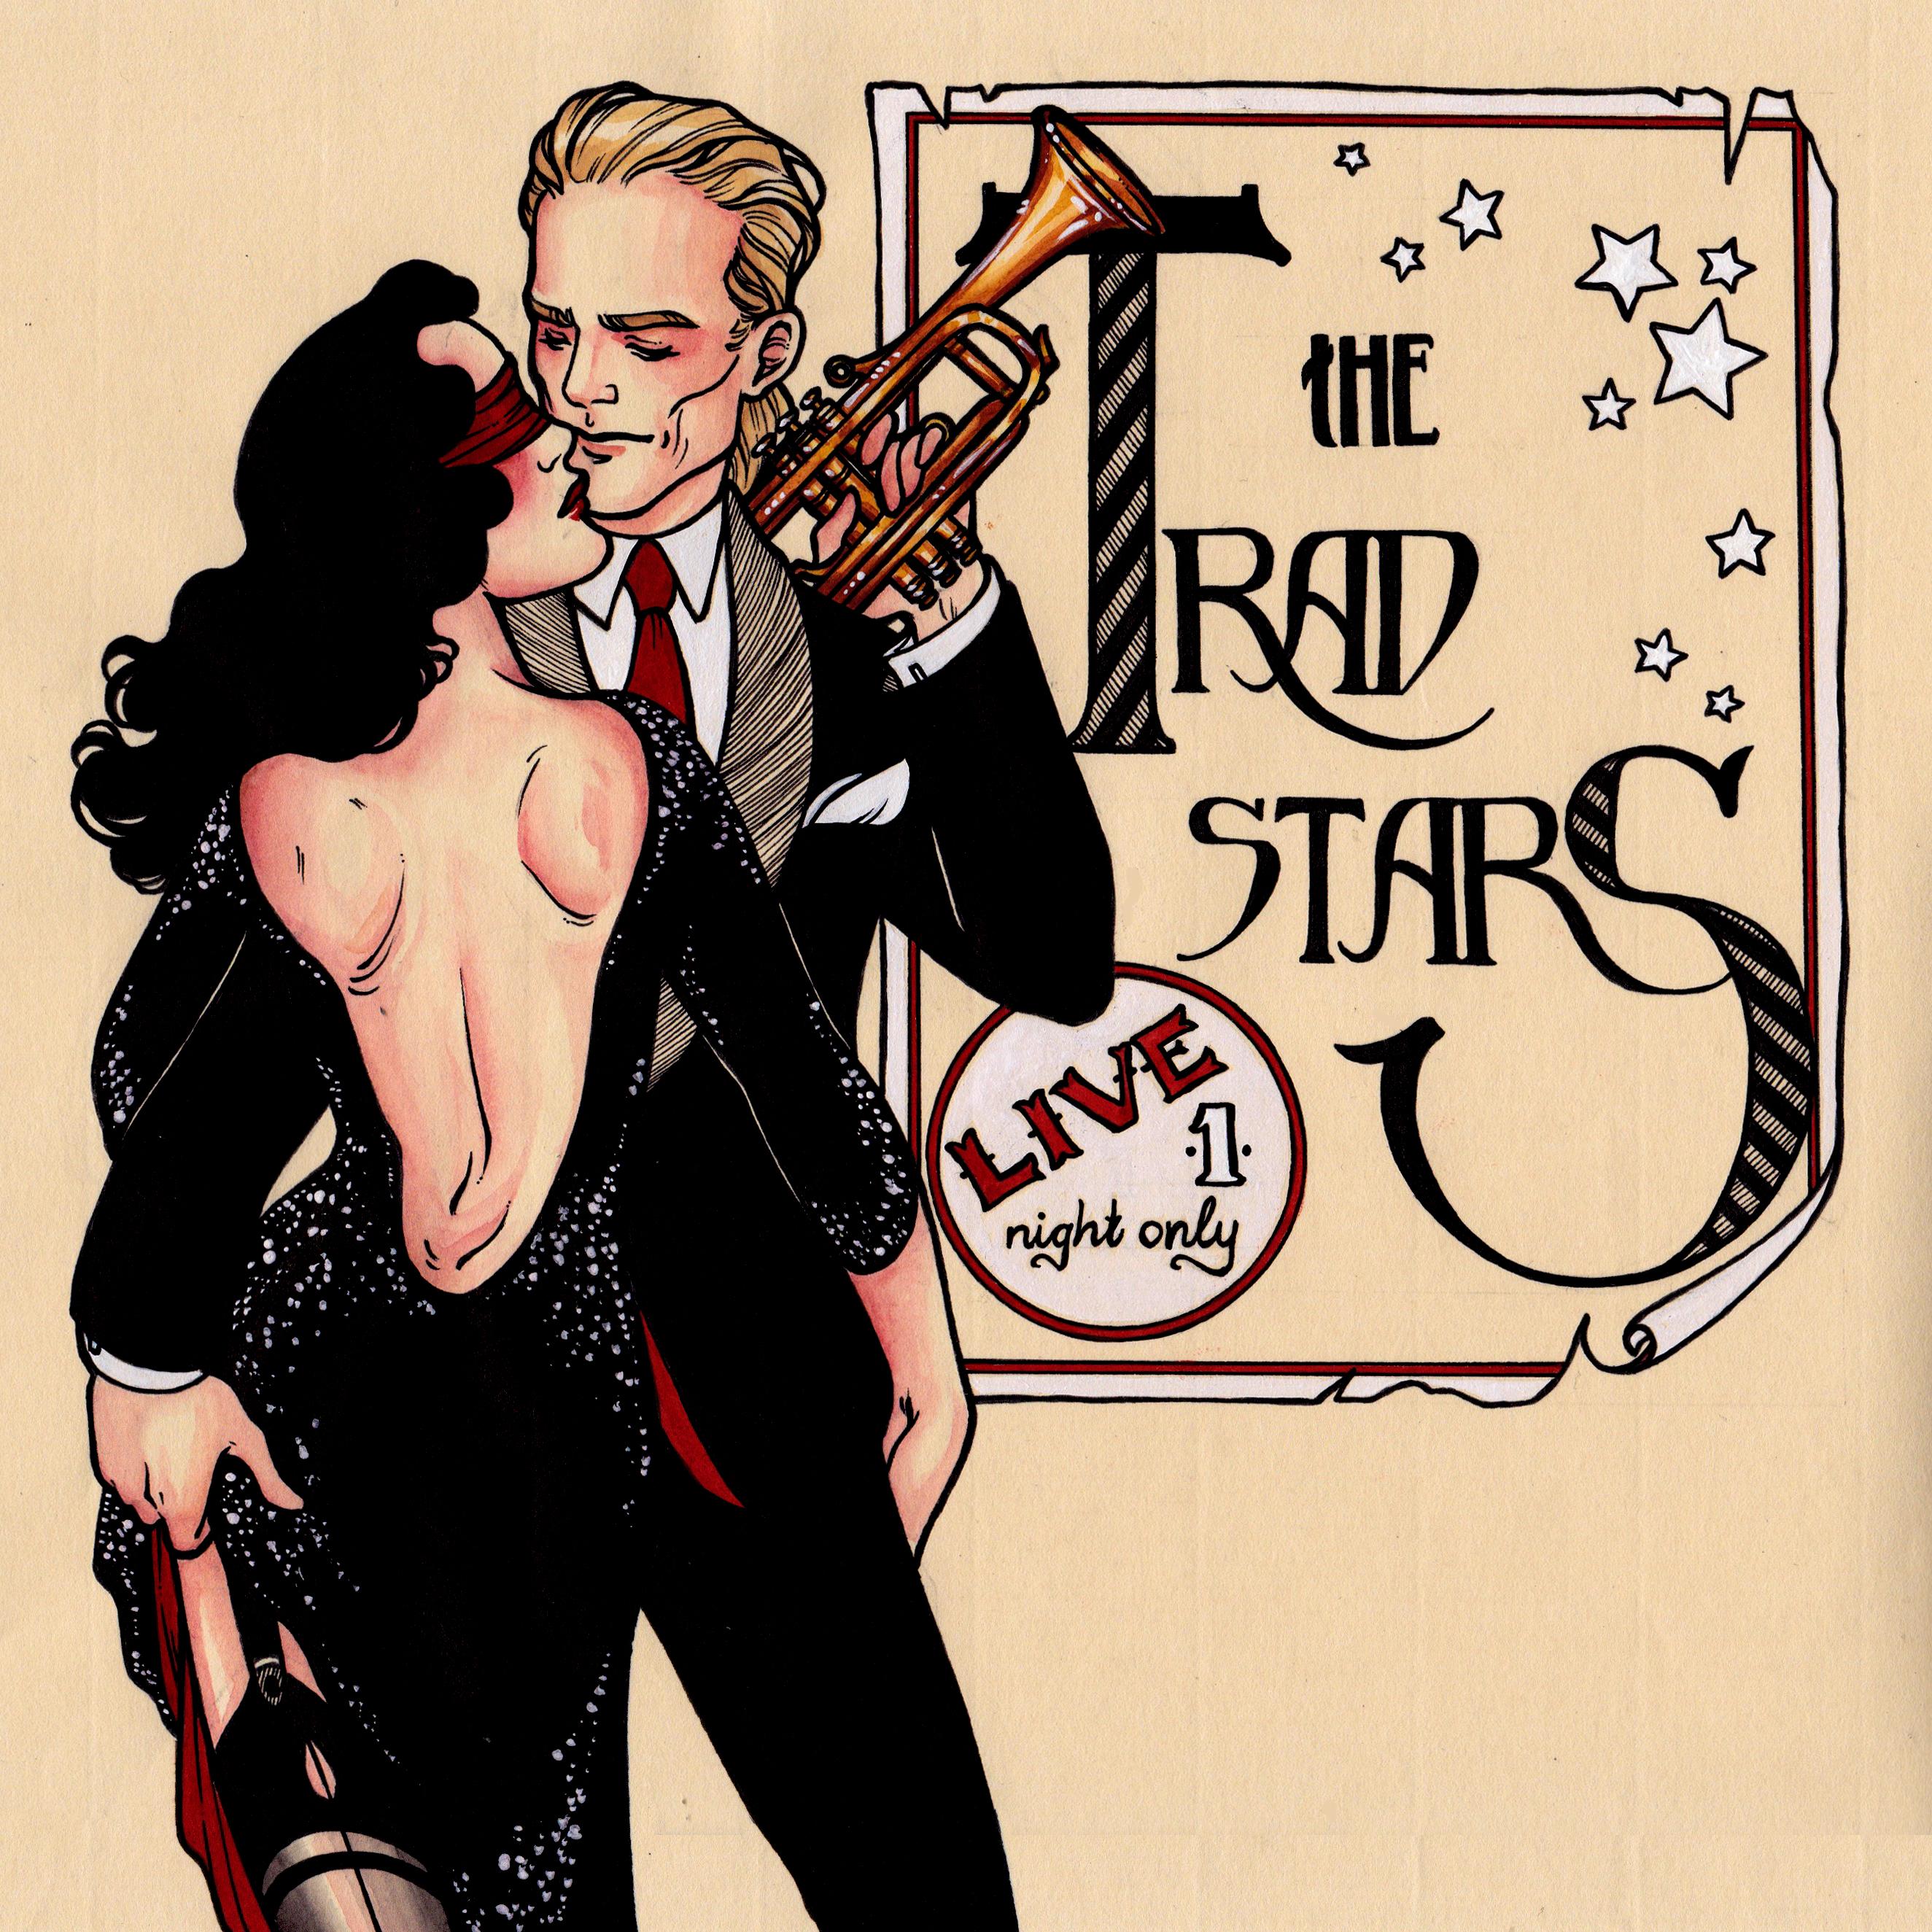 The Tradstars Music Album Cover